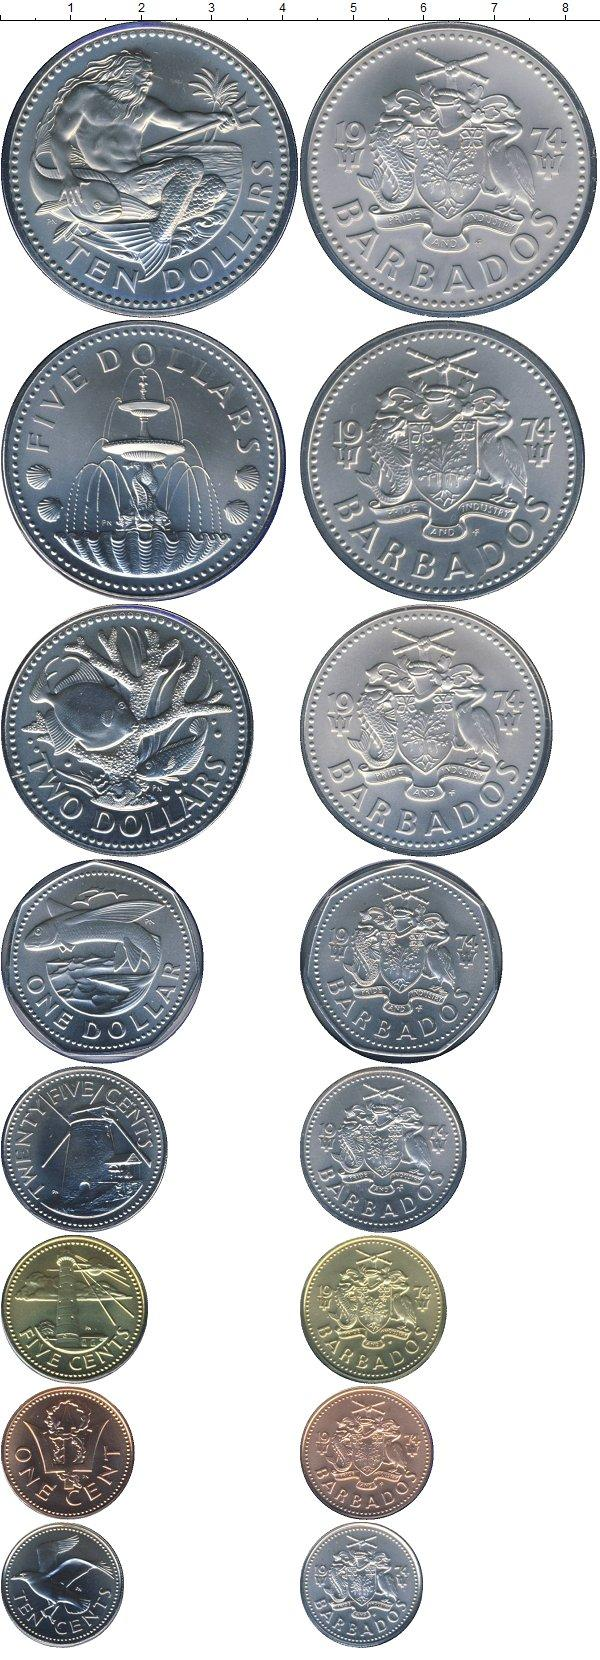 Каталог монет - Барбадос Выпуск монет 1974